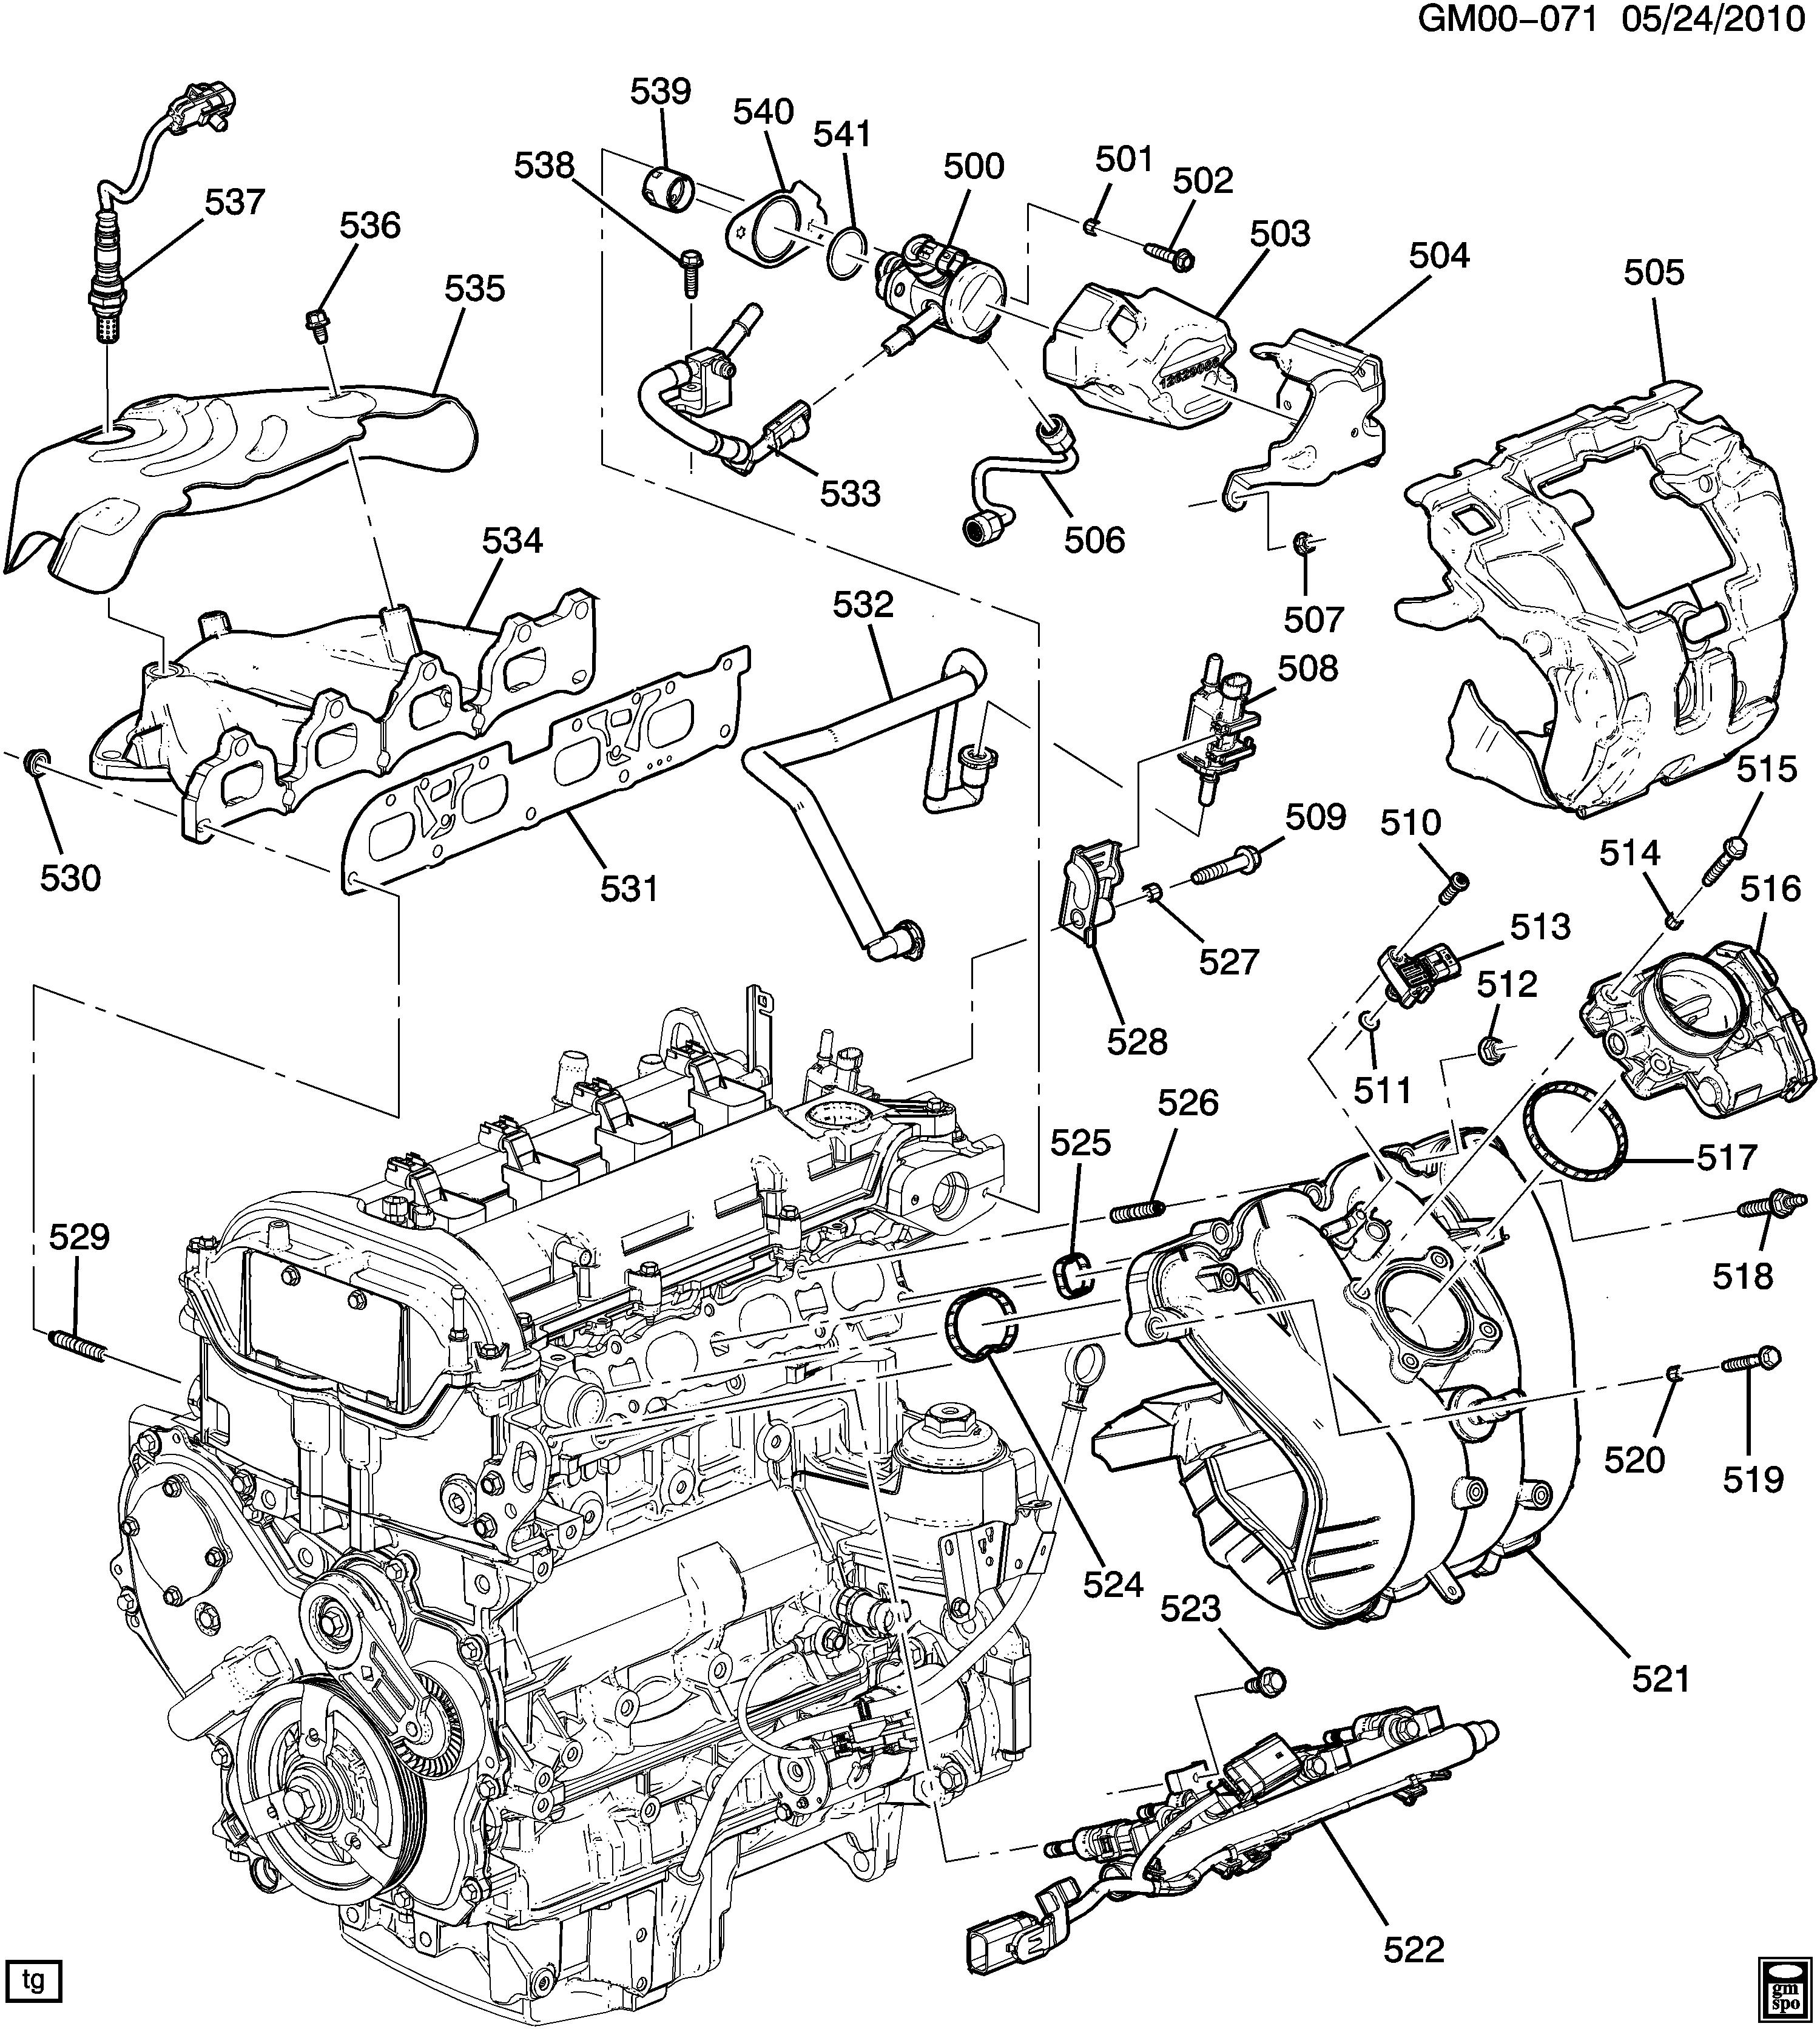 chevy equinox transmission diagrams 2011 equinox engine diagram wiring diagrams show  2011 equinox engine diagram wiring